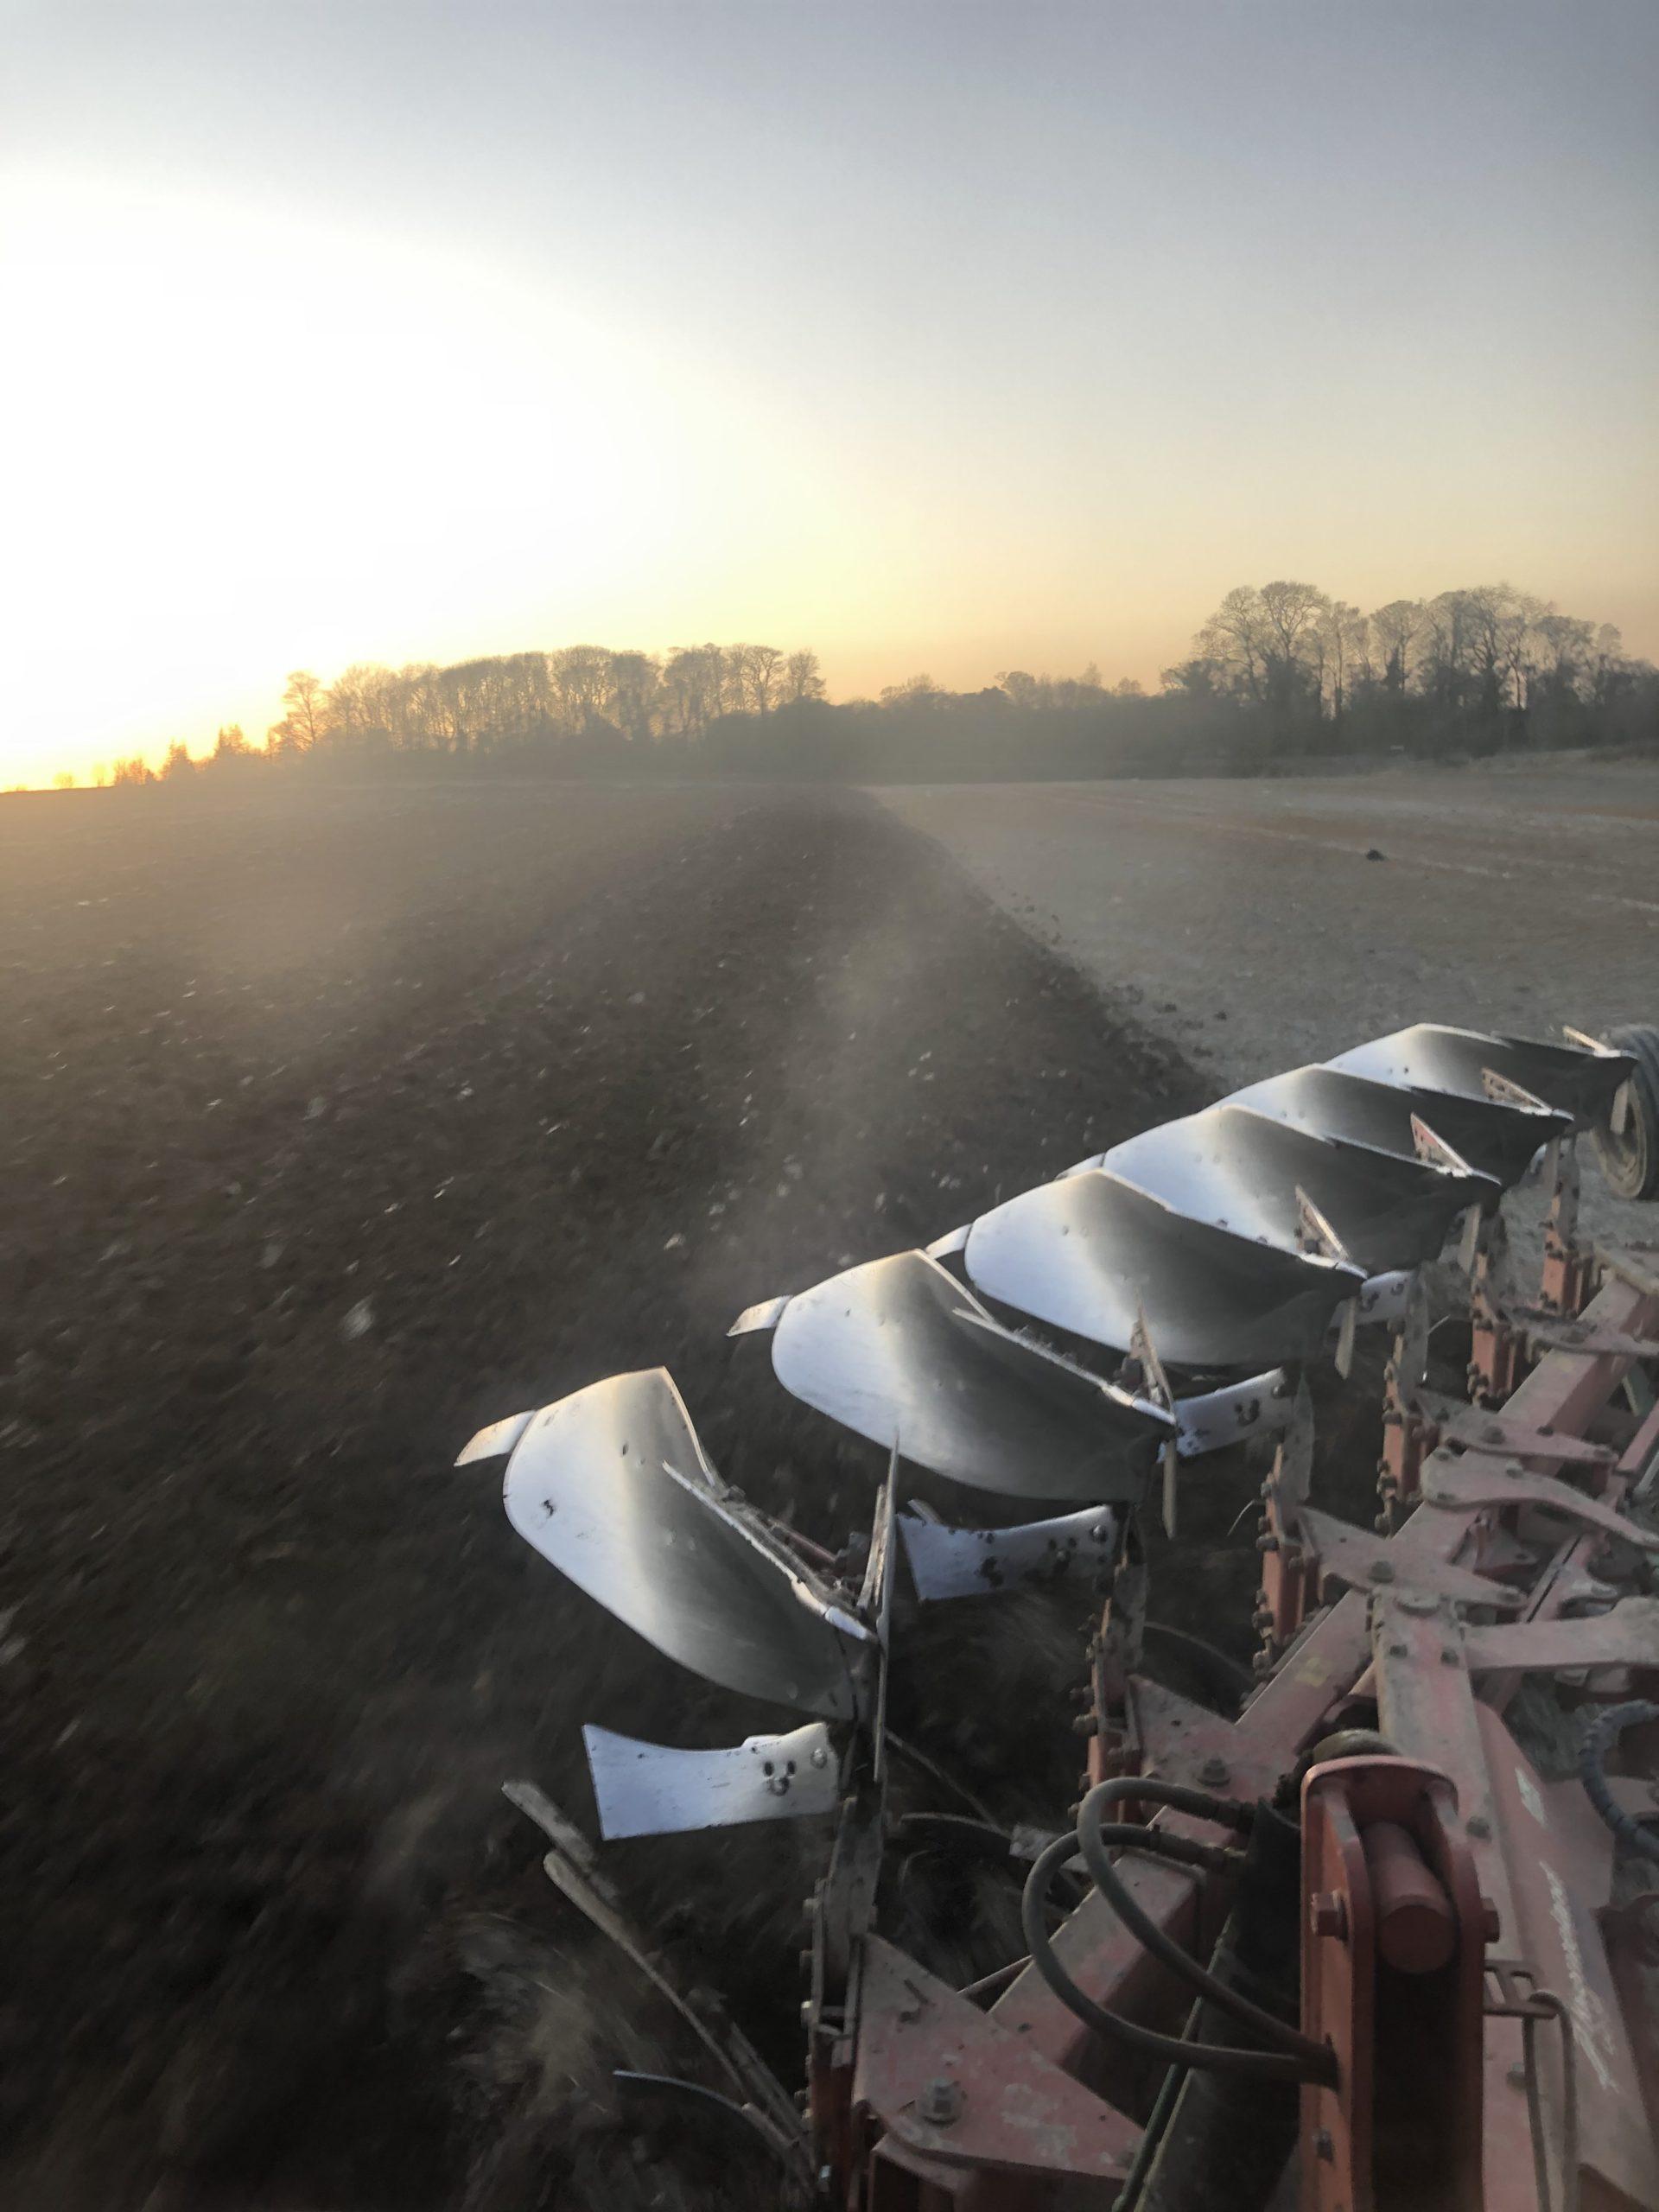 Ploughing the farm